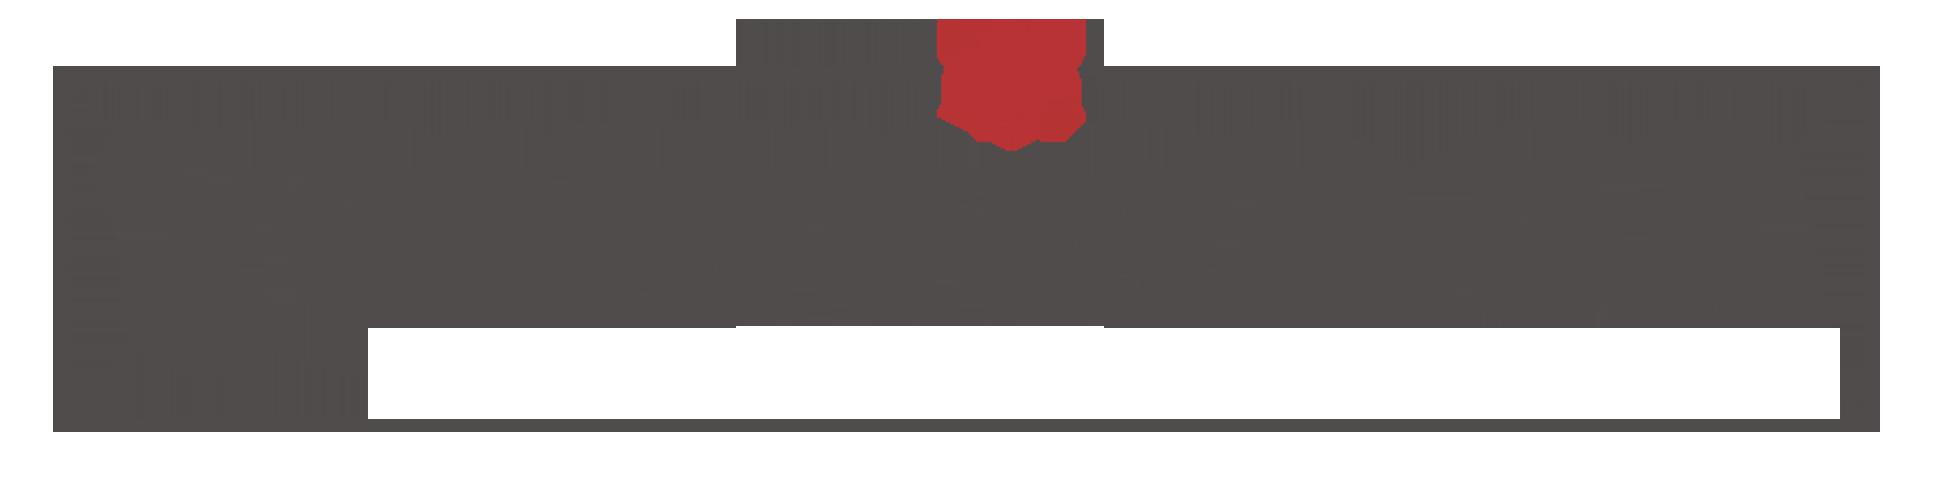 YourVisa.ca